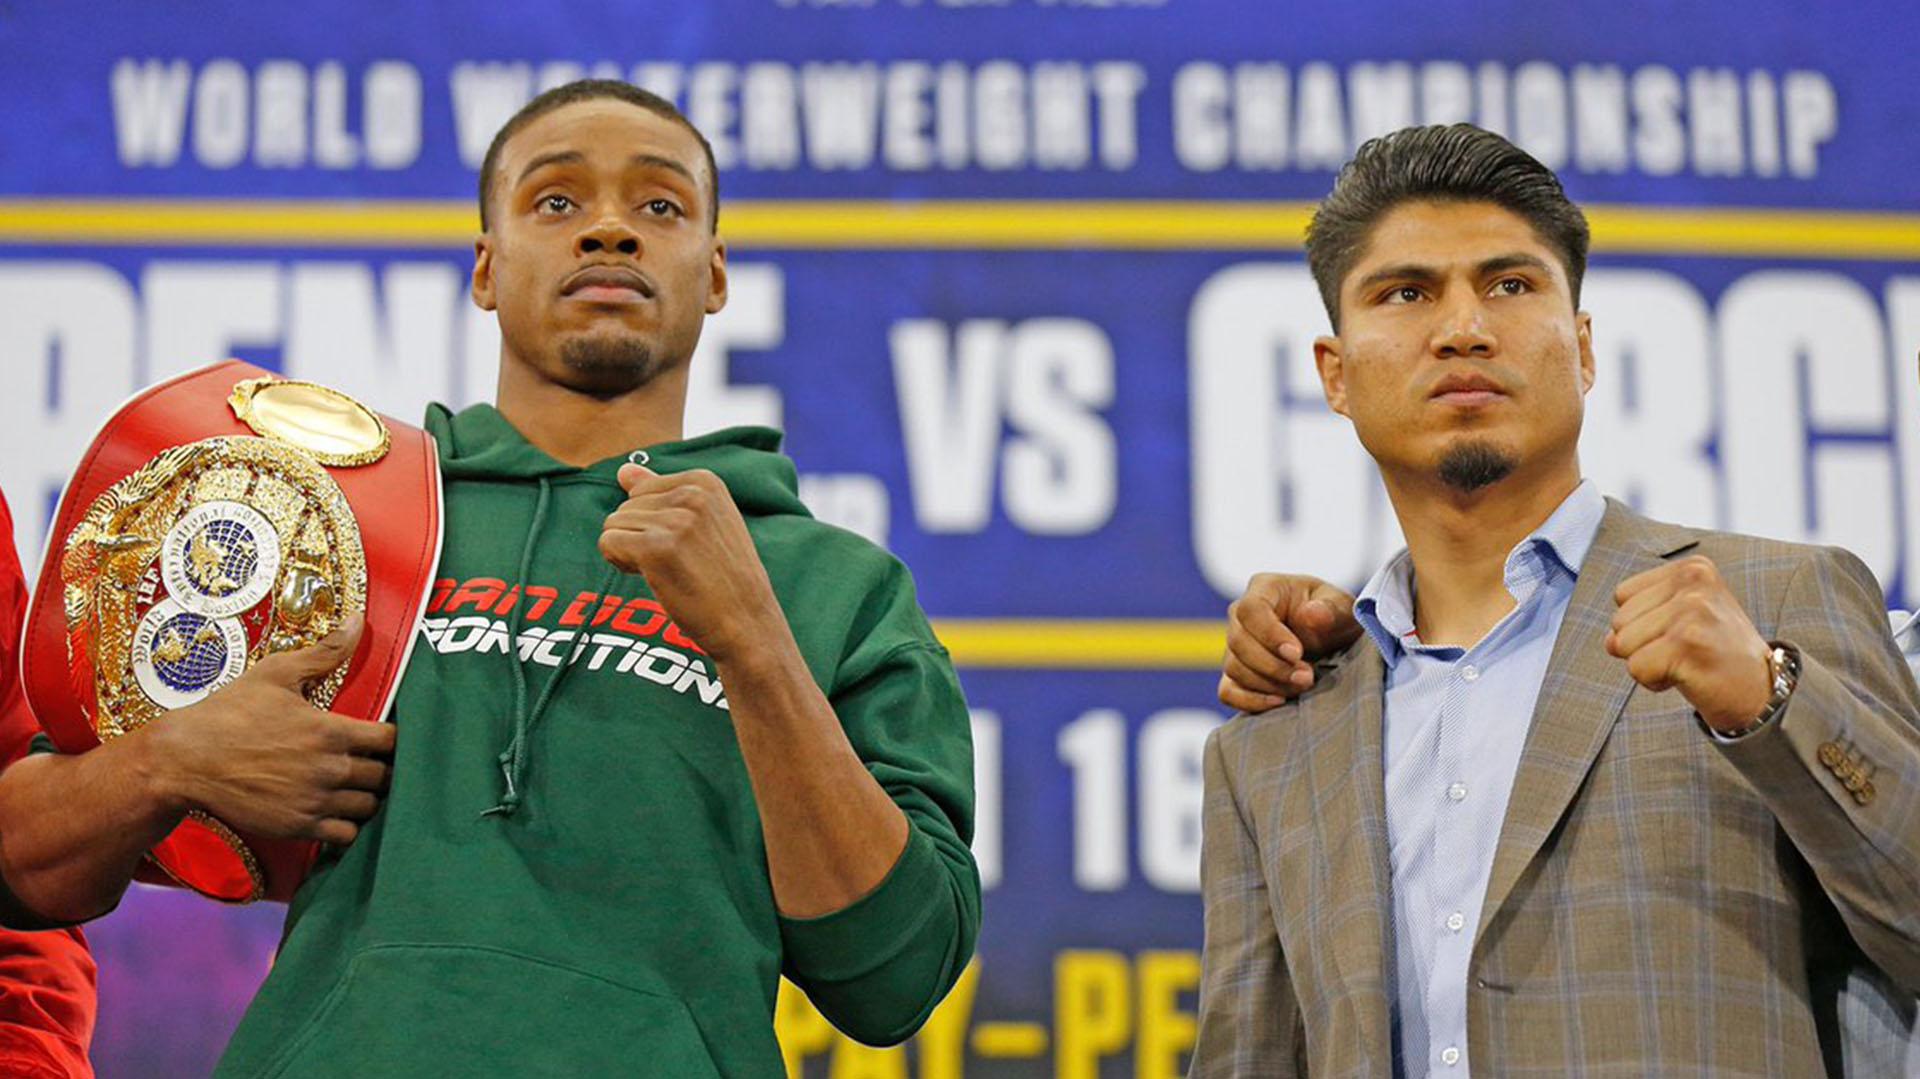 Tanto Spence Jr. como Mikey García llegaron a este combate invictos (@GarciaBoxing)